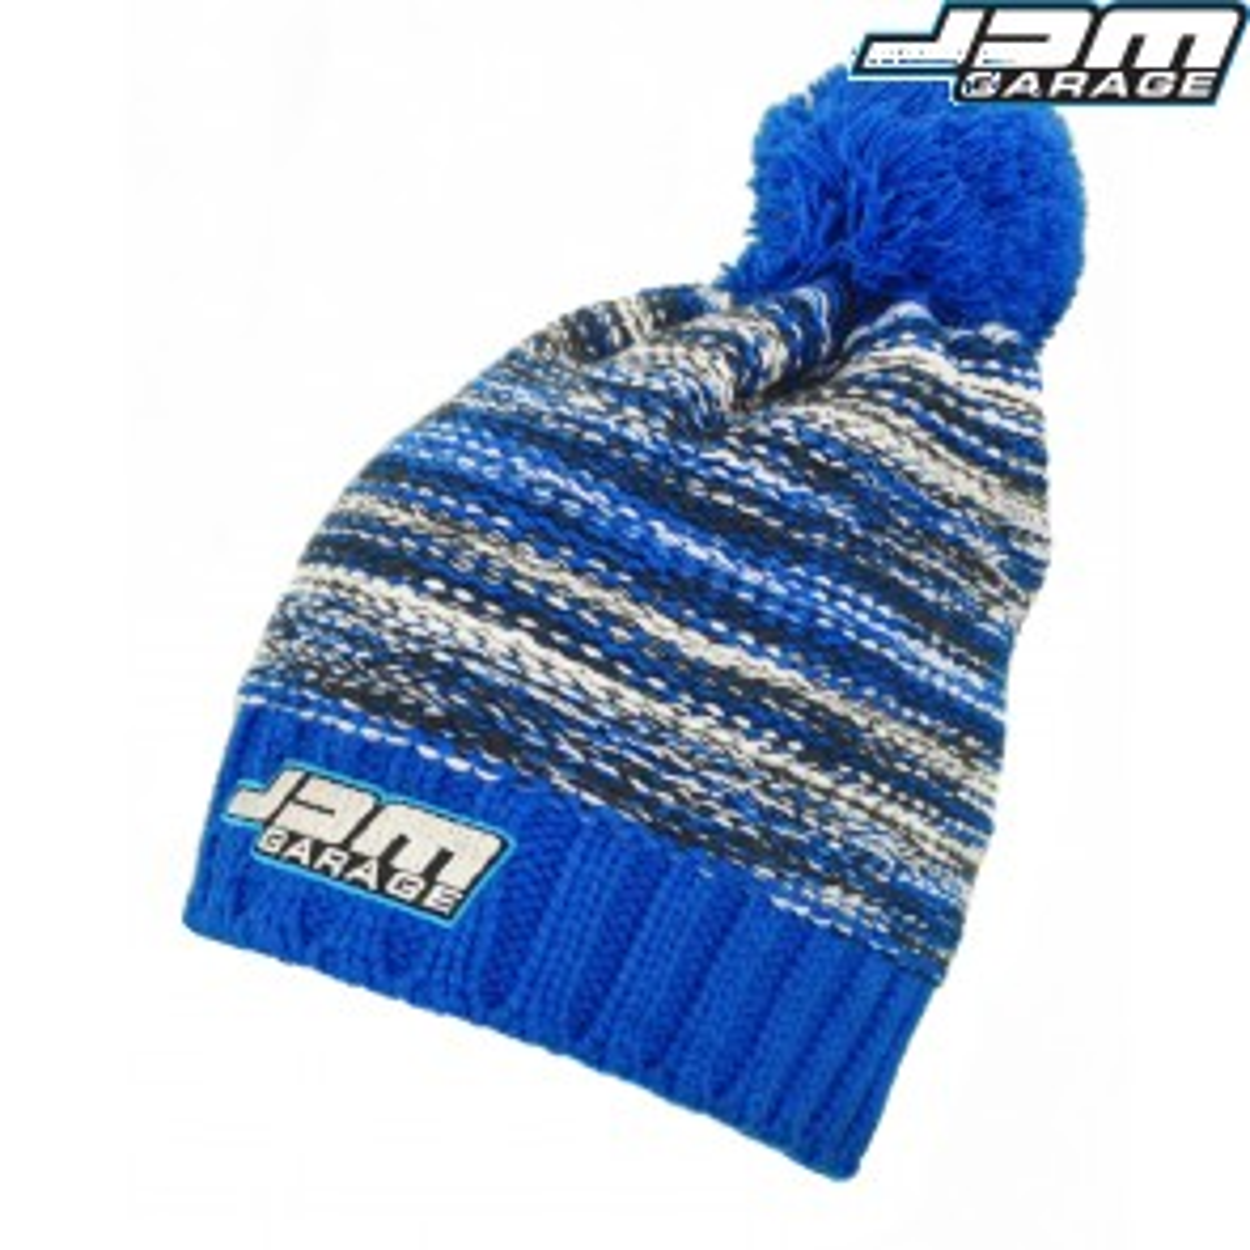 JDM Garage Slalom Boarder Beanie - Blue / Navy / White